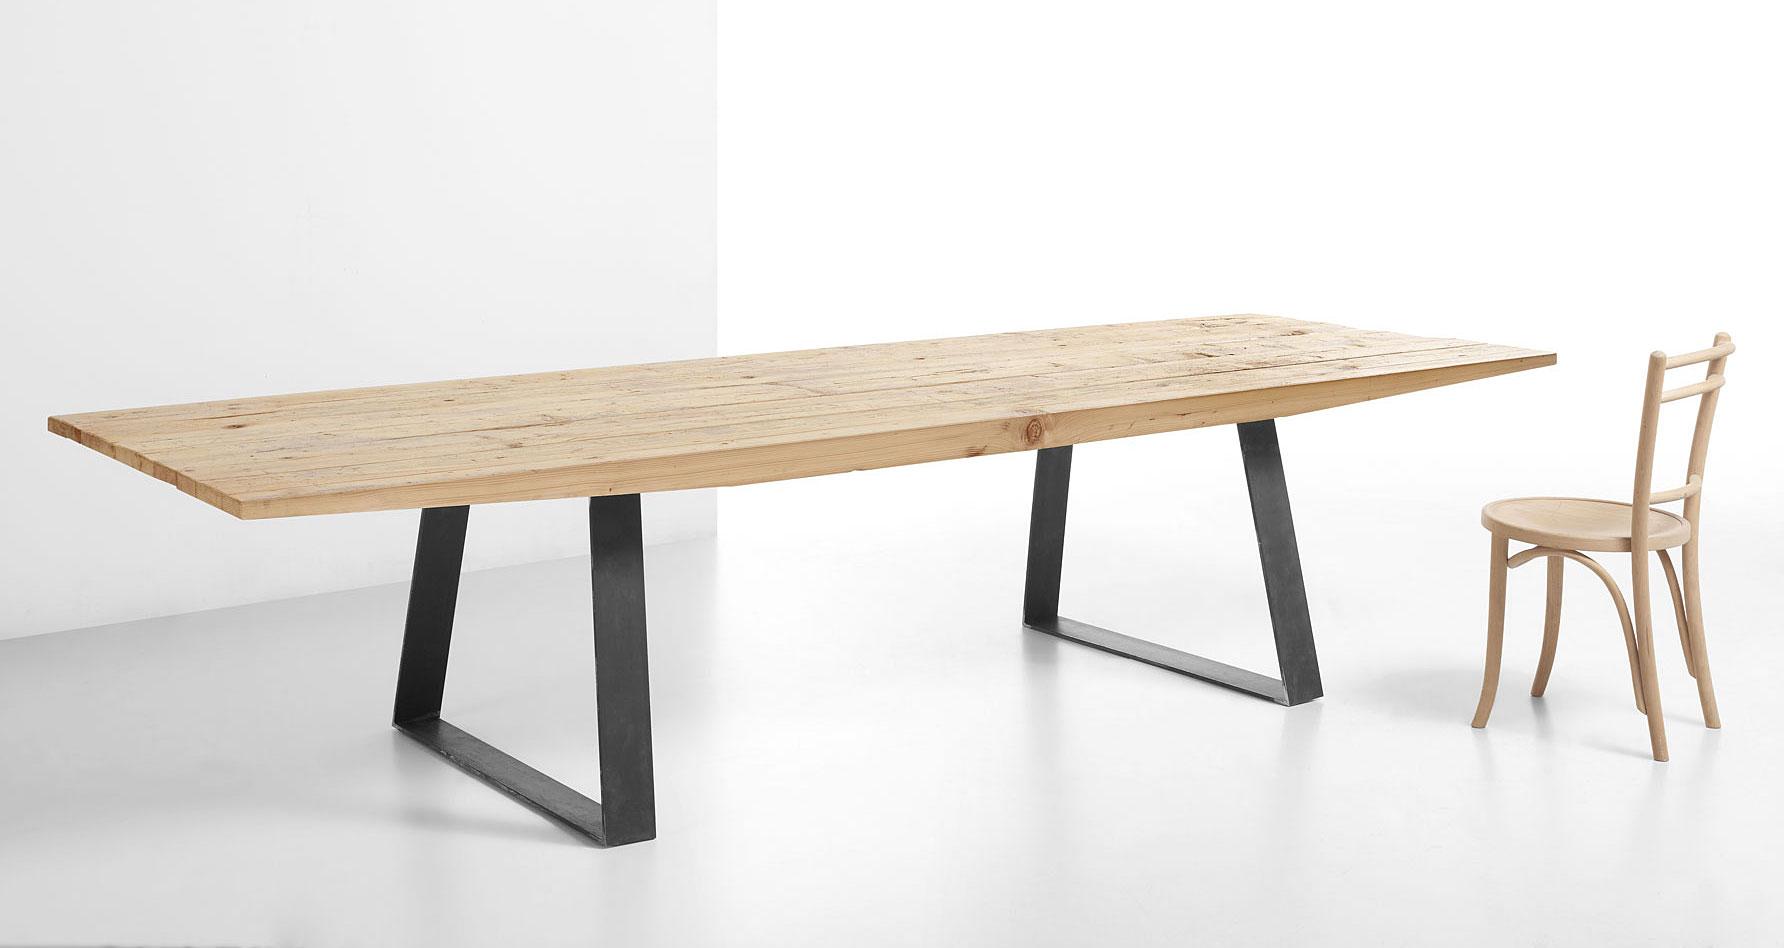 Mesa de comedor fly madera centenaria no disponible en for Mesa comedor madera